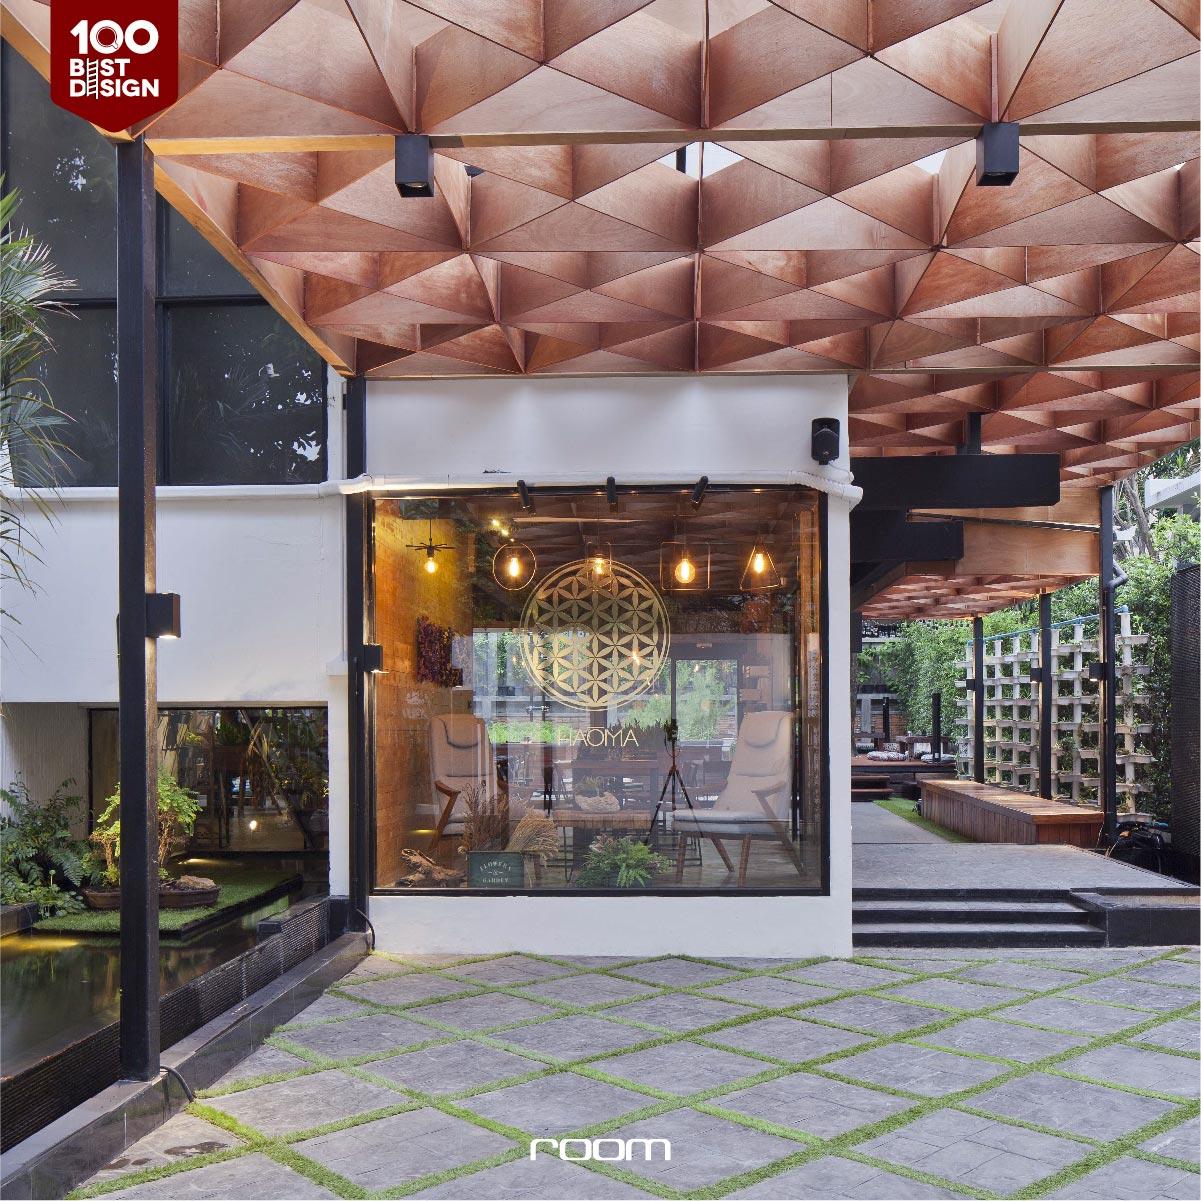 Wood Restaurant Idea - Renovate restaurant